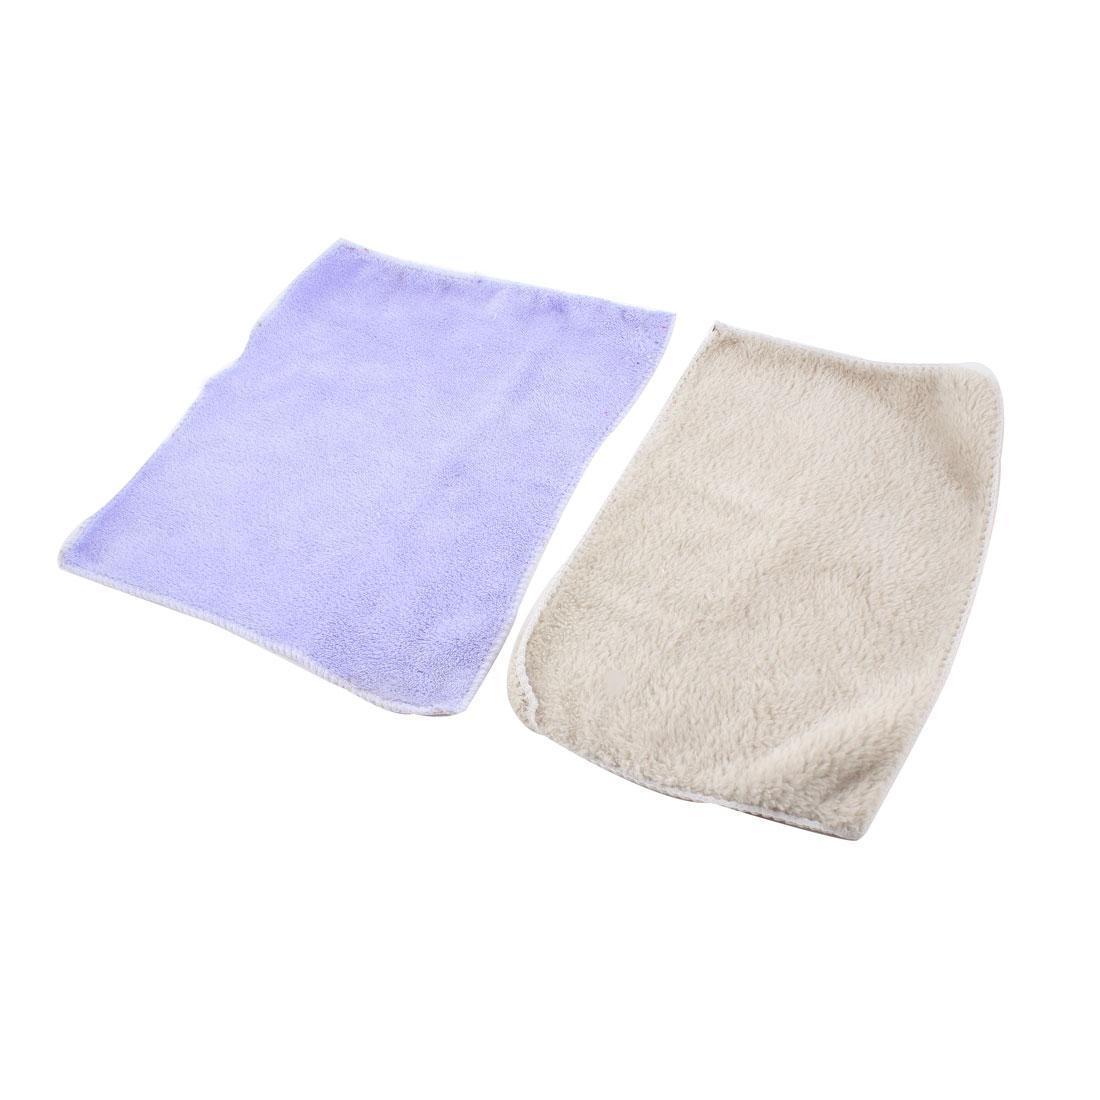 2Pcs Light Purple Beige Cleaning Towel Wash Towel Cloth for Car Door Glass